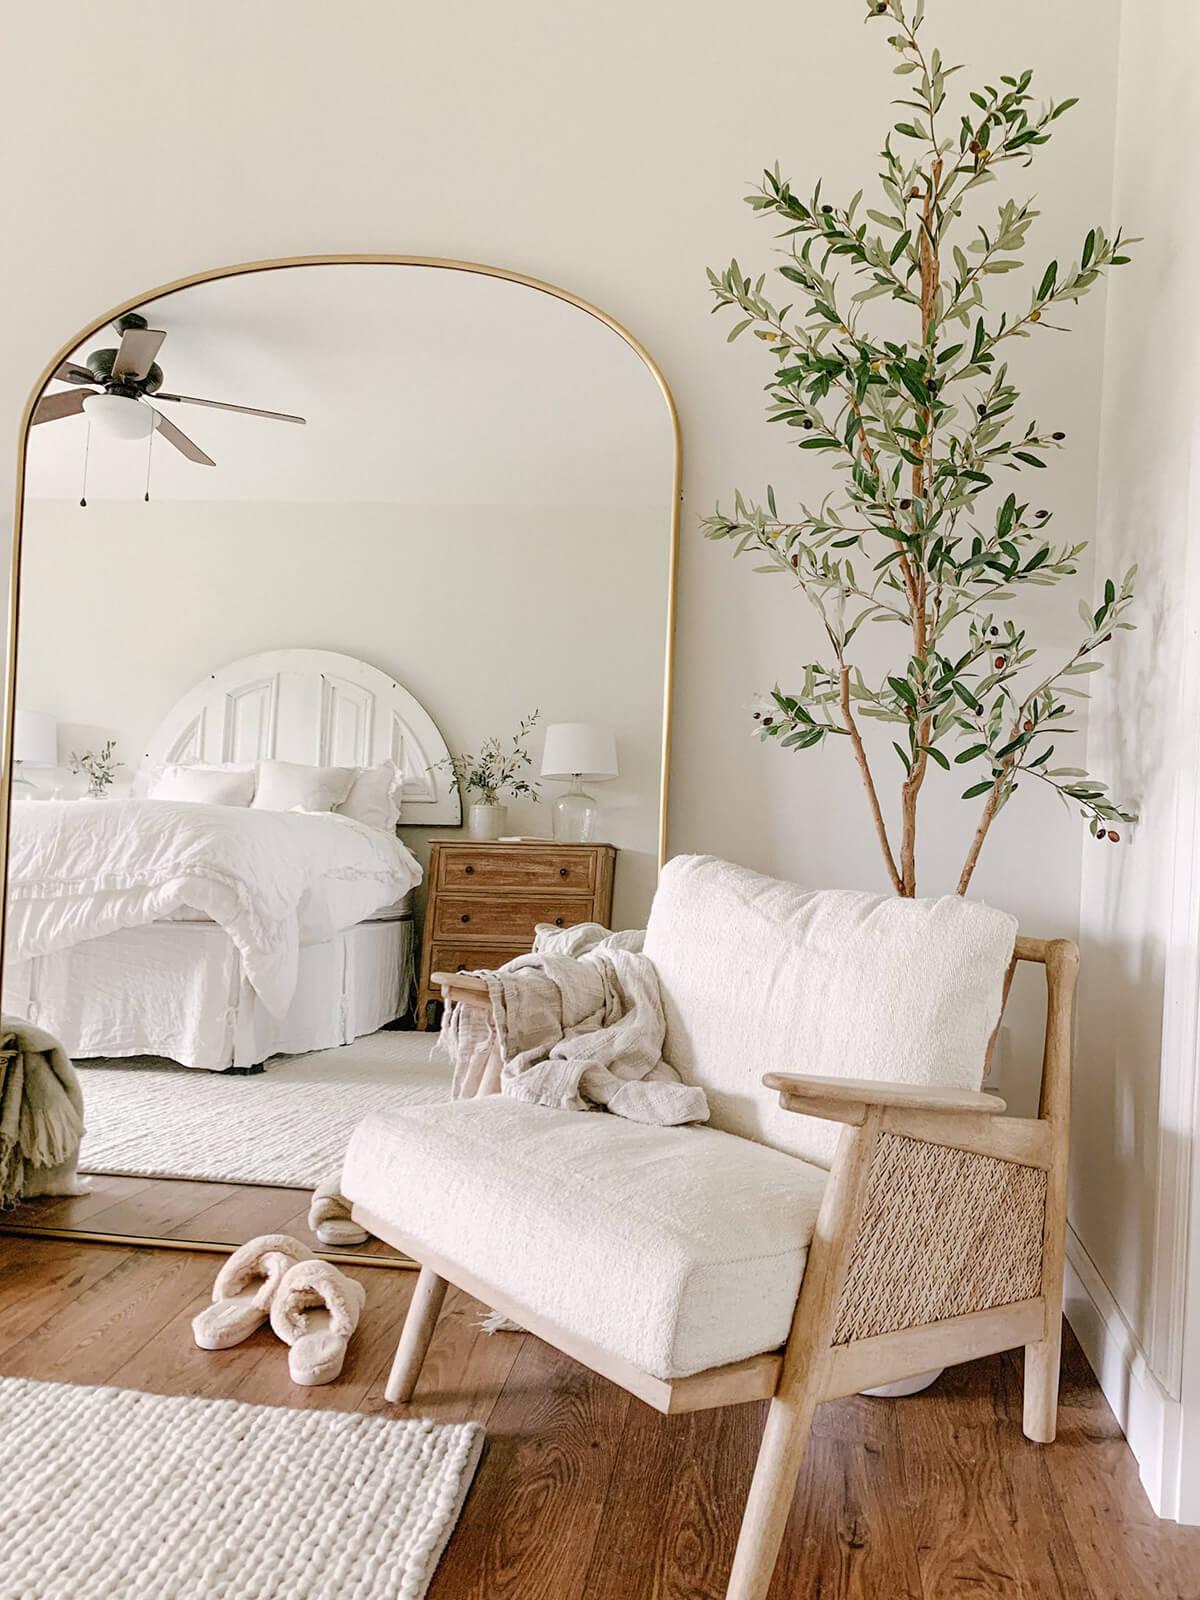 Laidback Scandi Bedroom Décor Idea